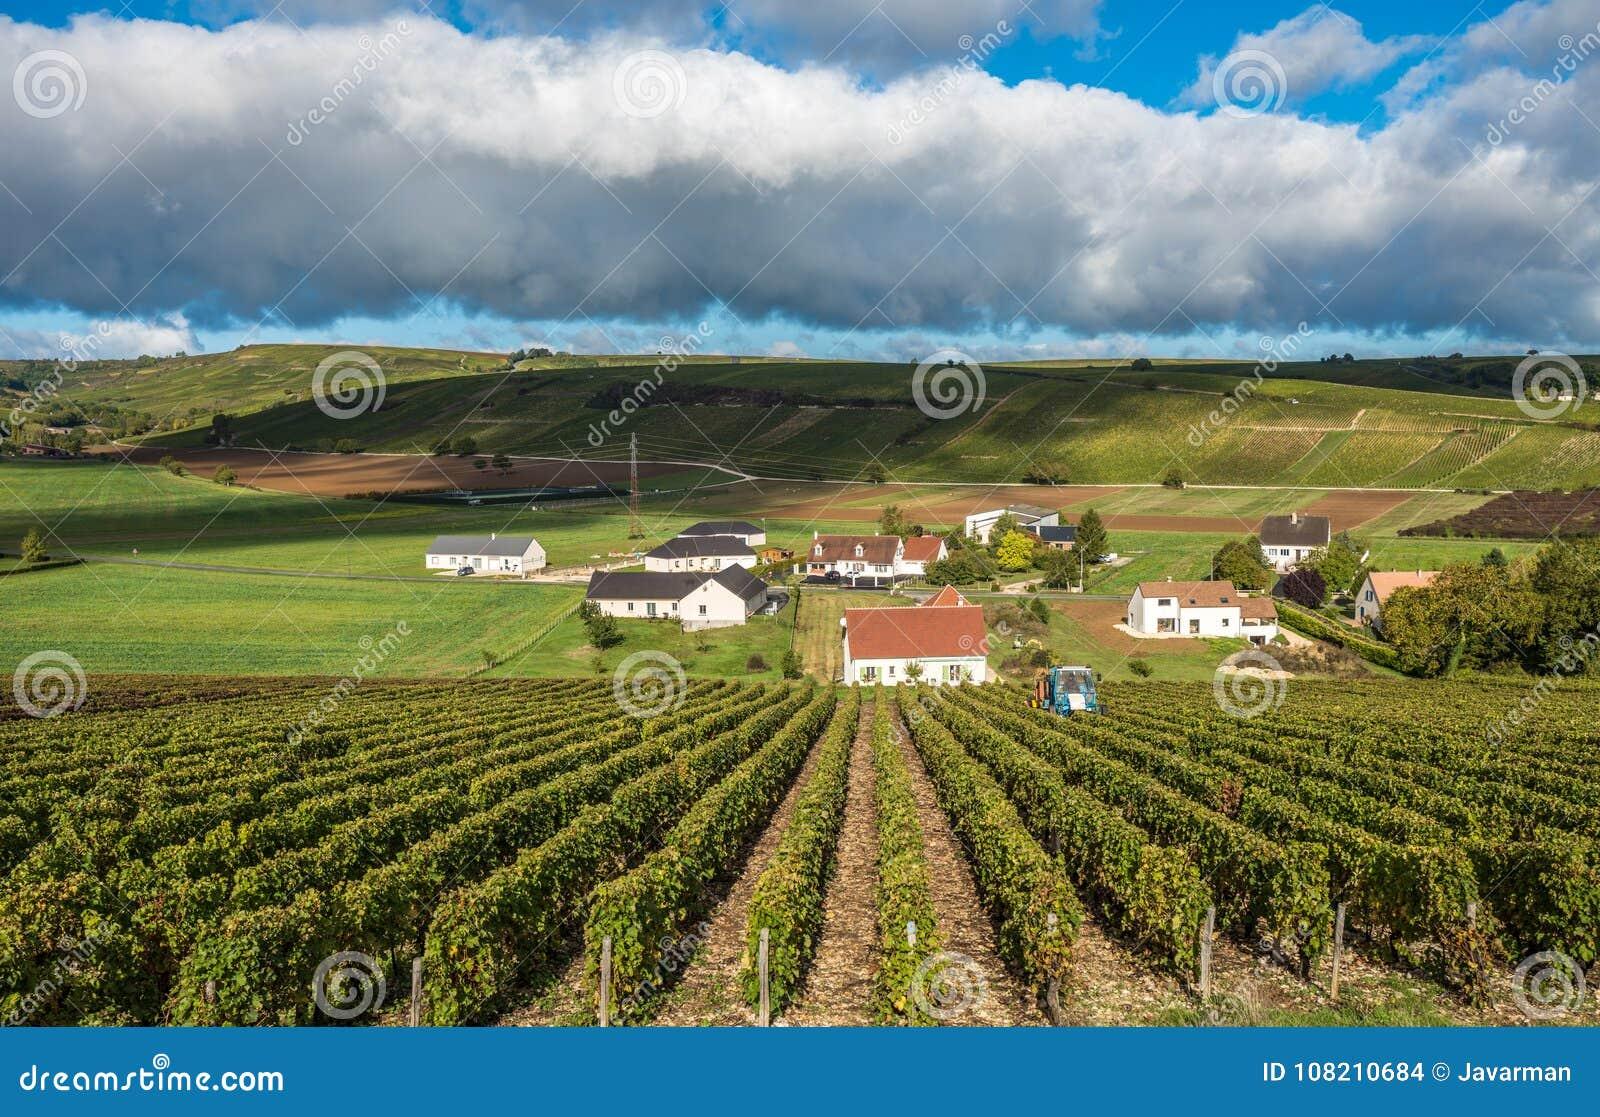 Viñedos Del Valle Del Loira Francia Foto De Archivo Imagen De Paisaje Uvas 108210684